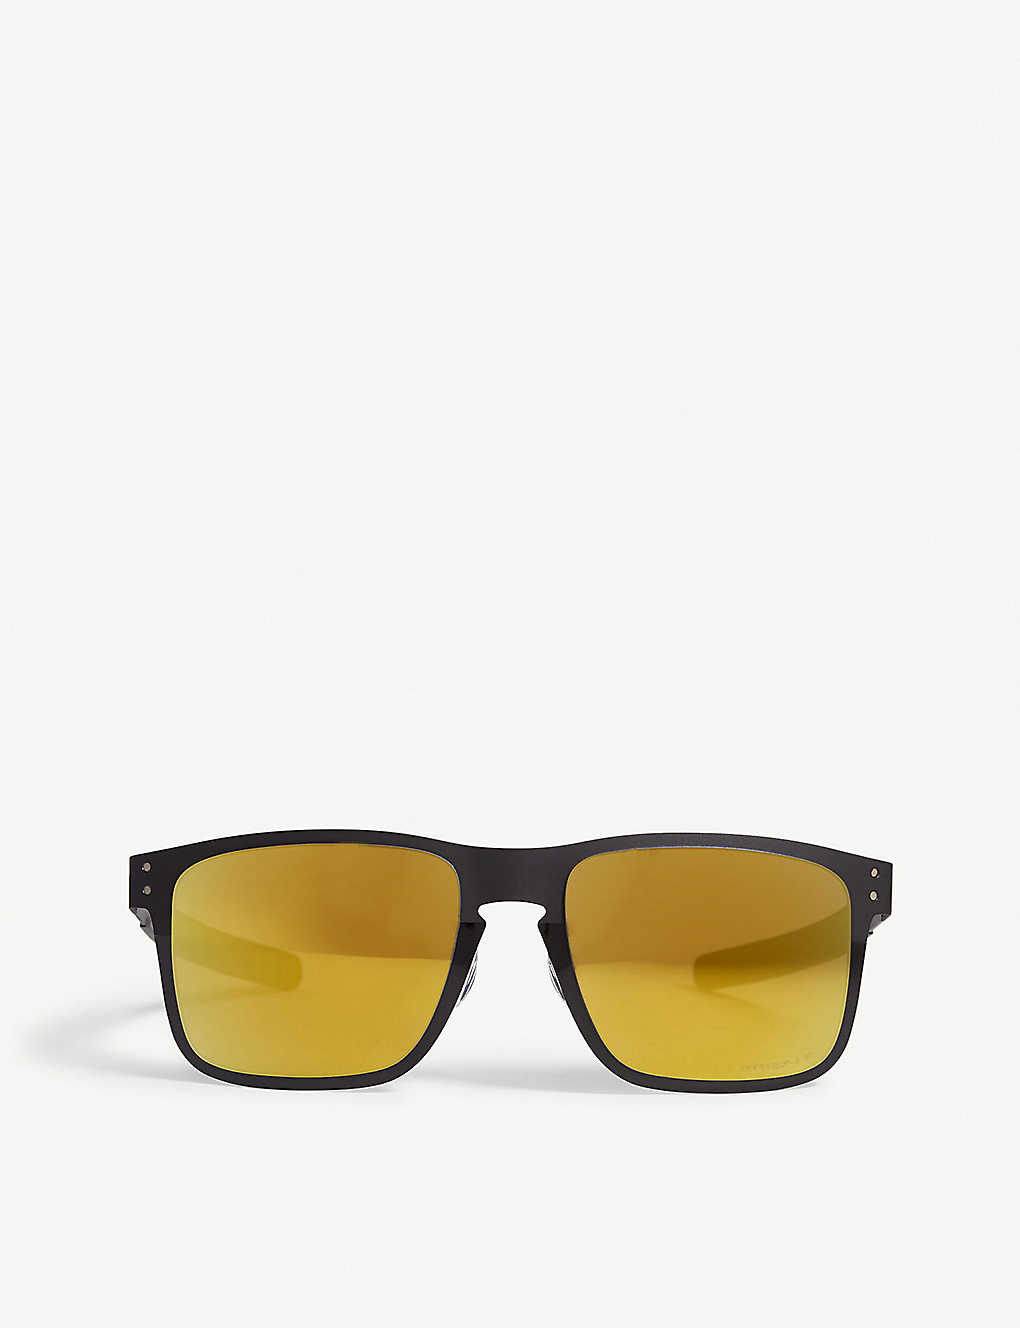 10793428875 OAKLEY - OO4123-2055 Holbrook Metal square-frame sunglasses ...